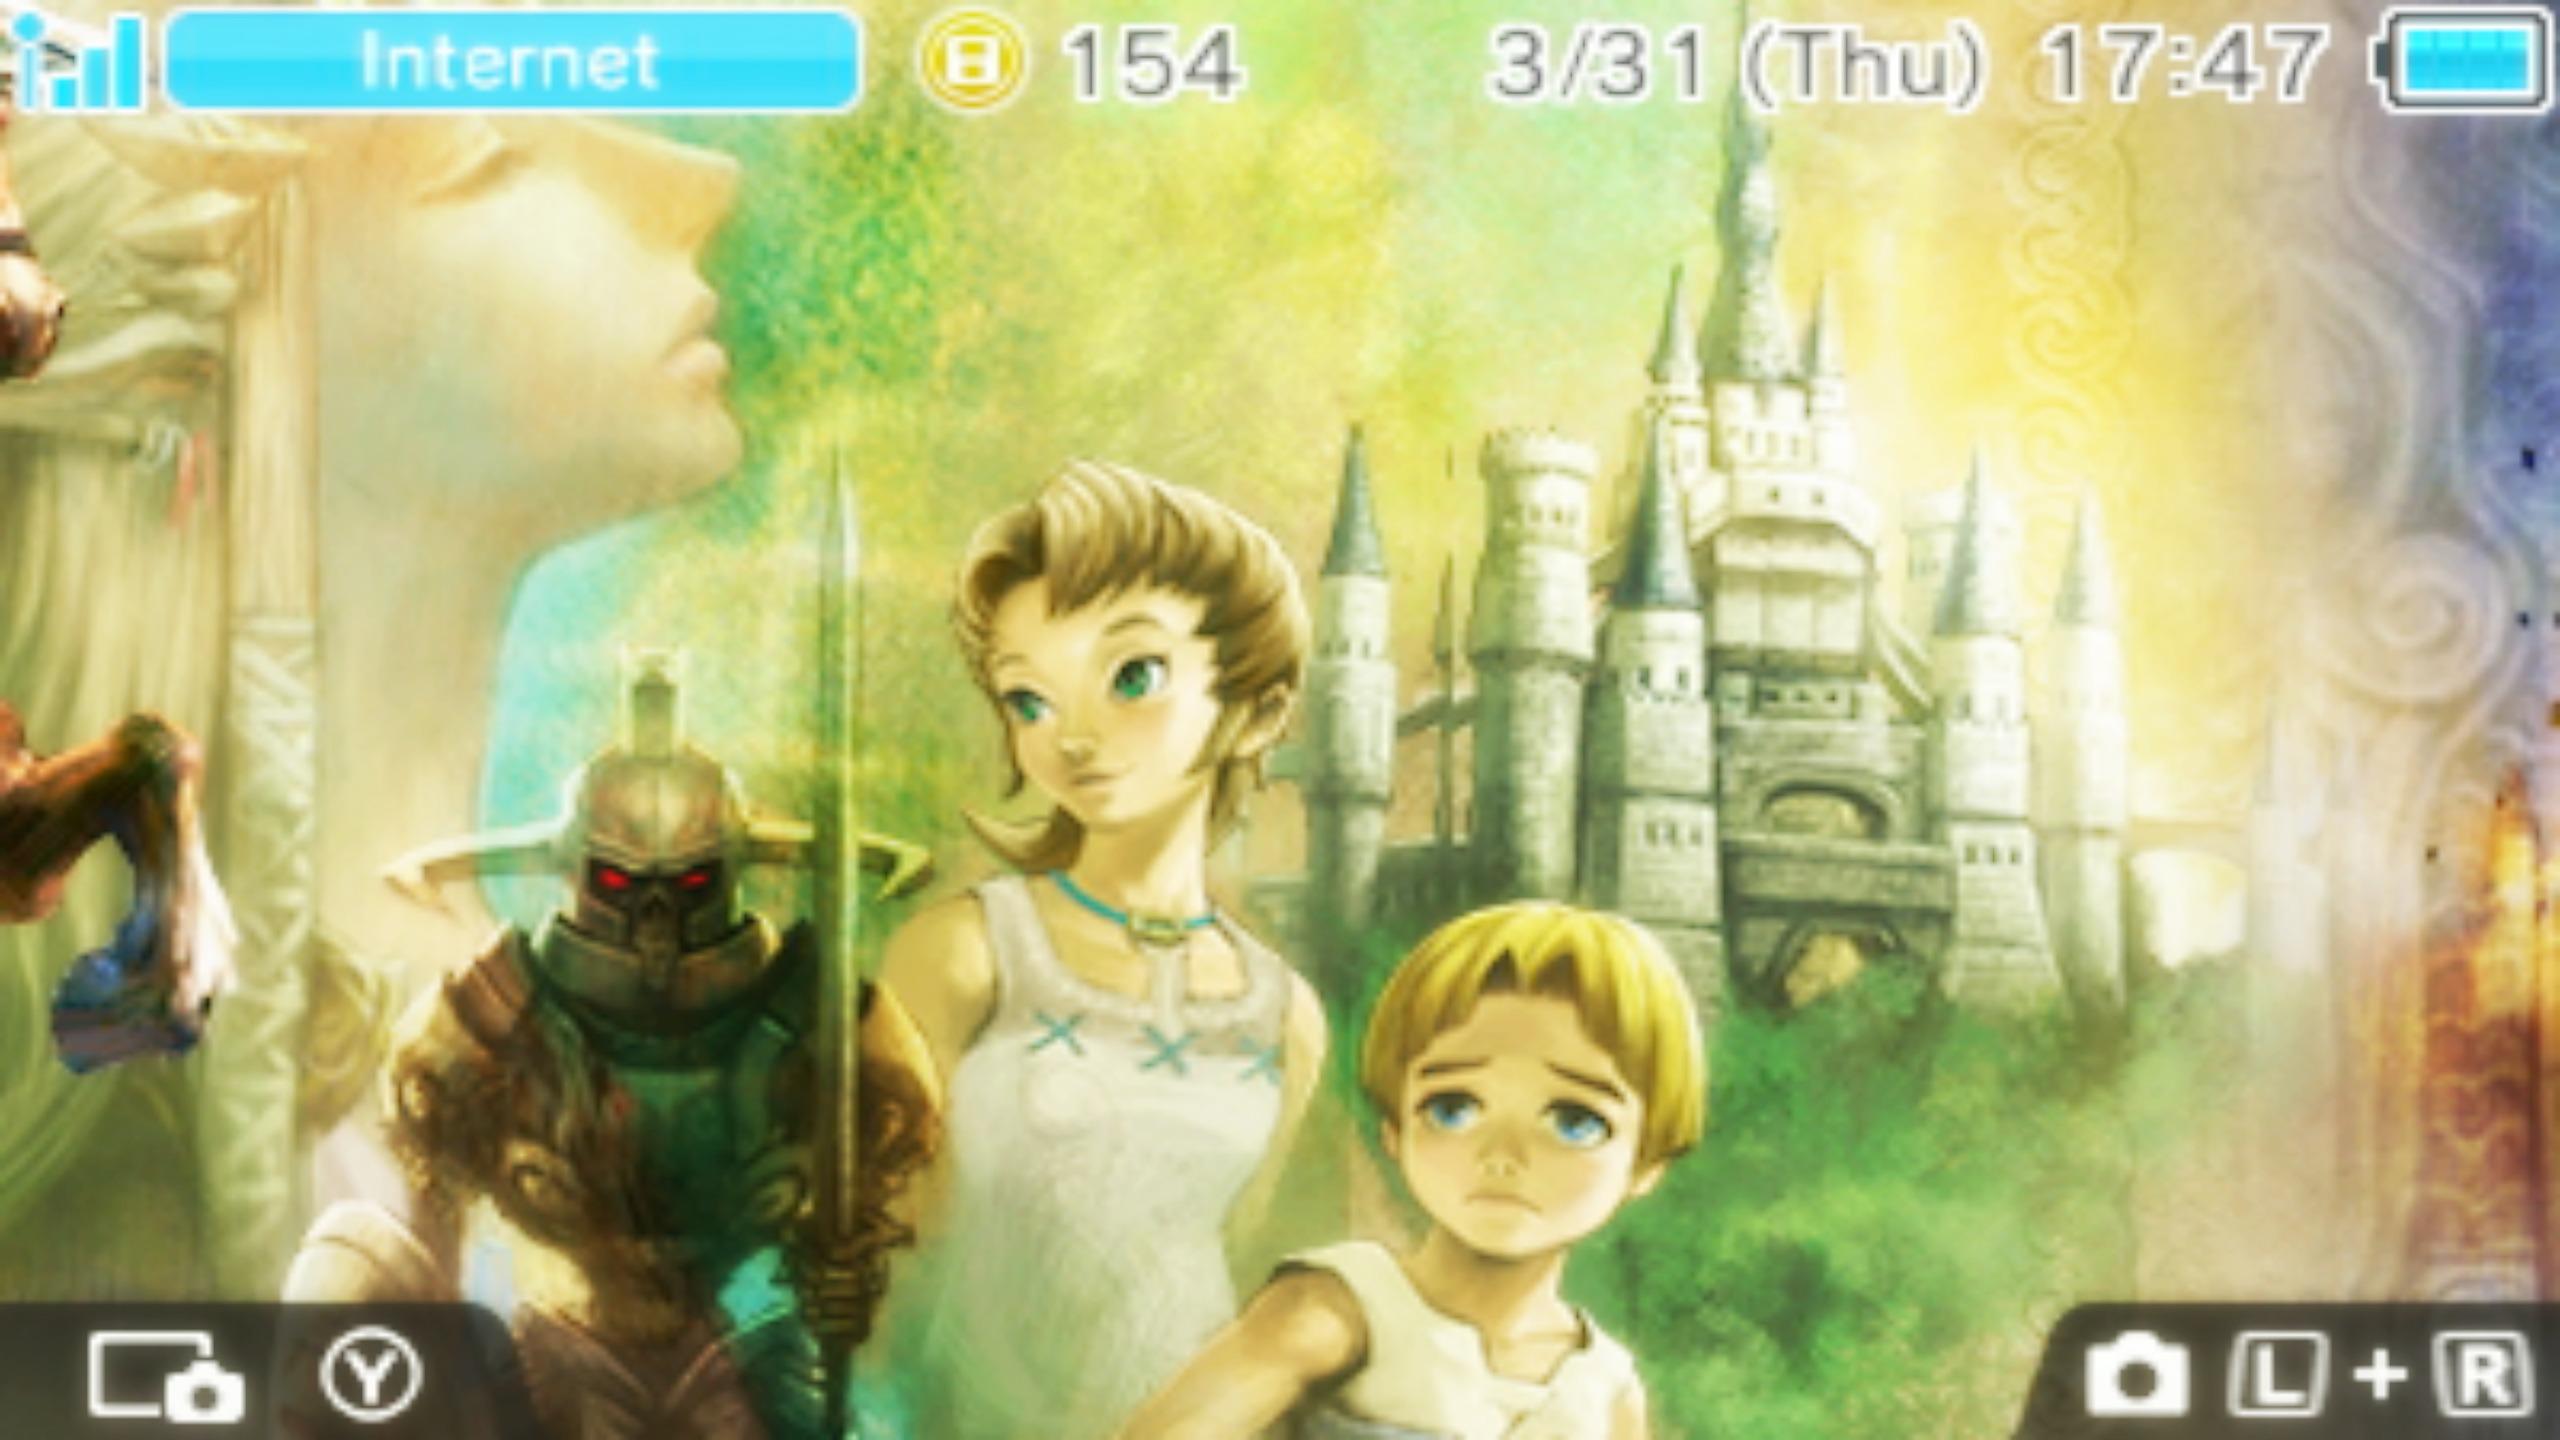 Twilight Princess Hd 3ds Wallpaper 2 By Obsessedgamergal86